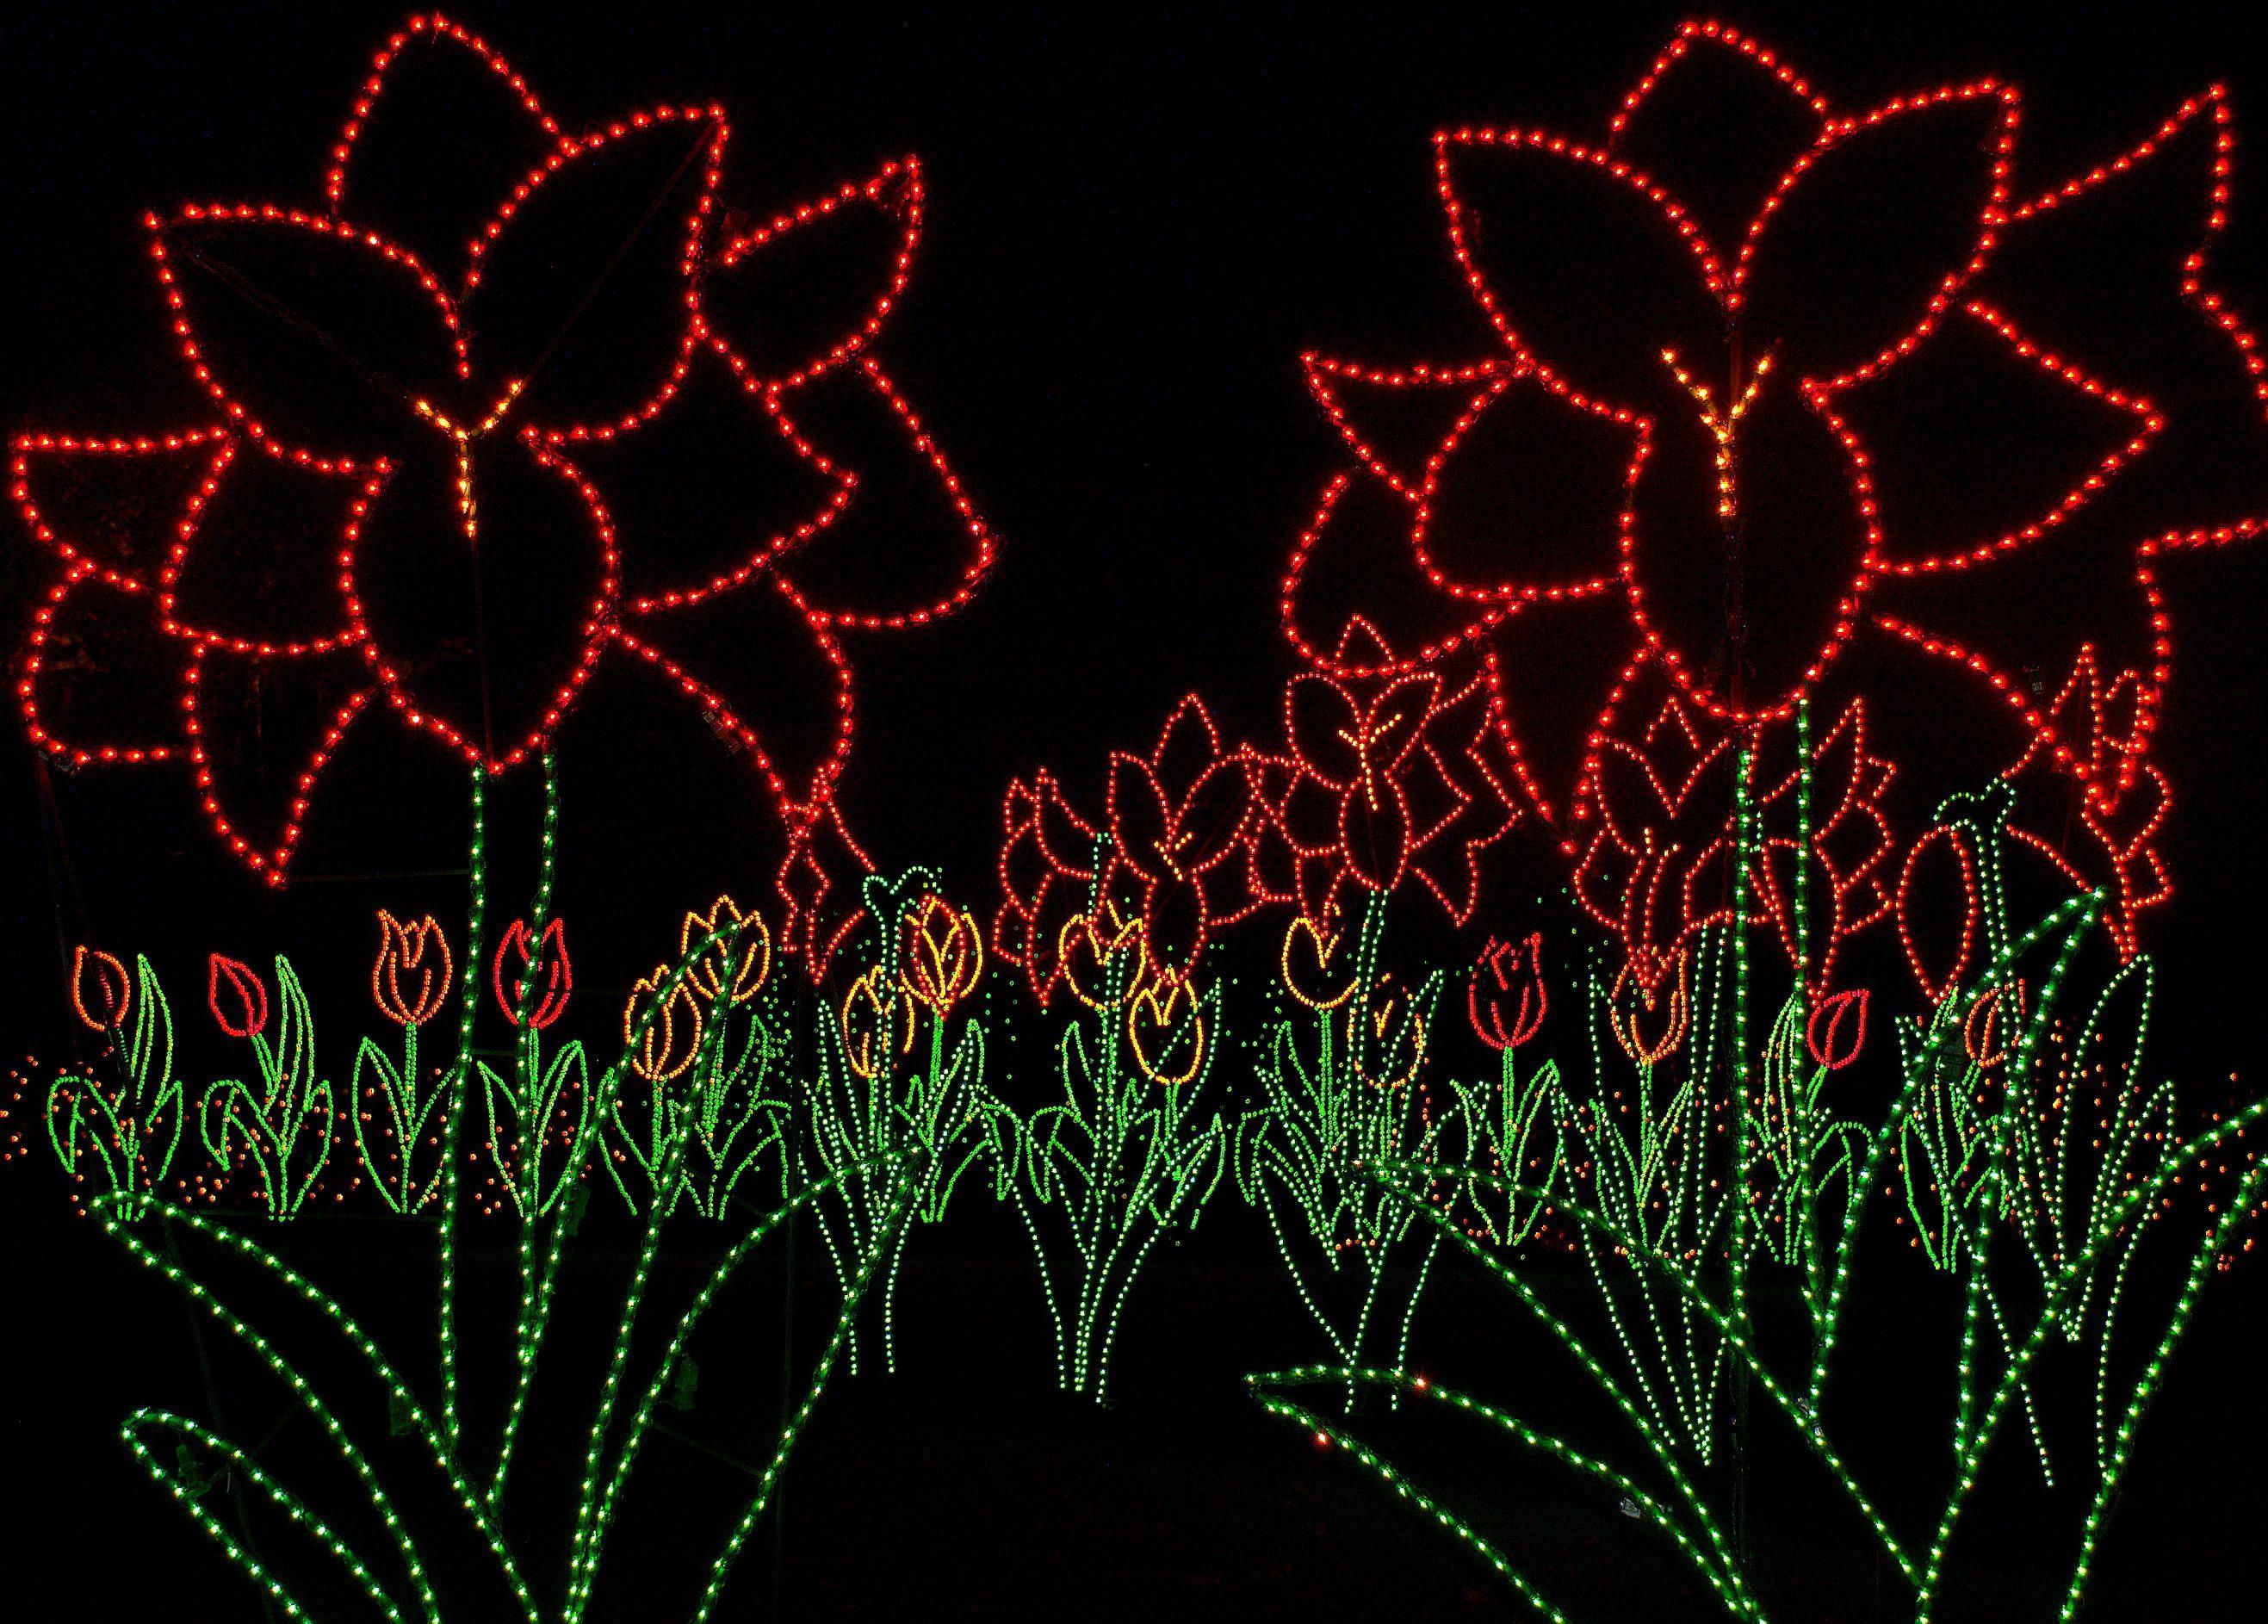 bellingrath garden oriental dragon christmas lights | Walk through the flowers at Bellingrath Gardens' Magic ...